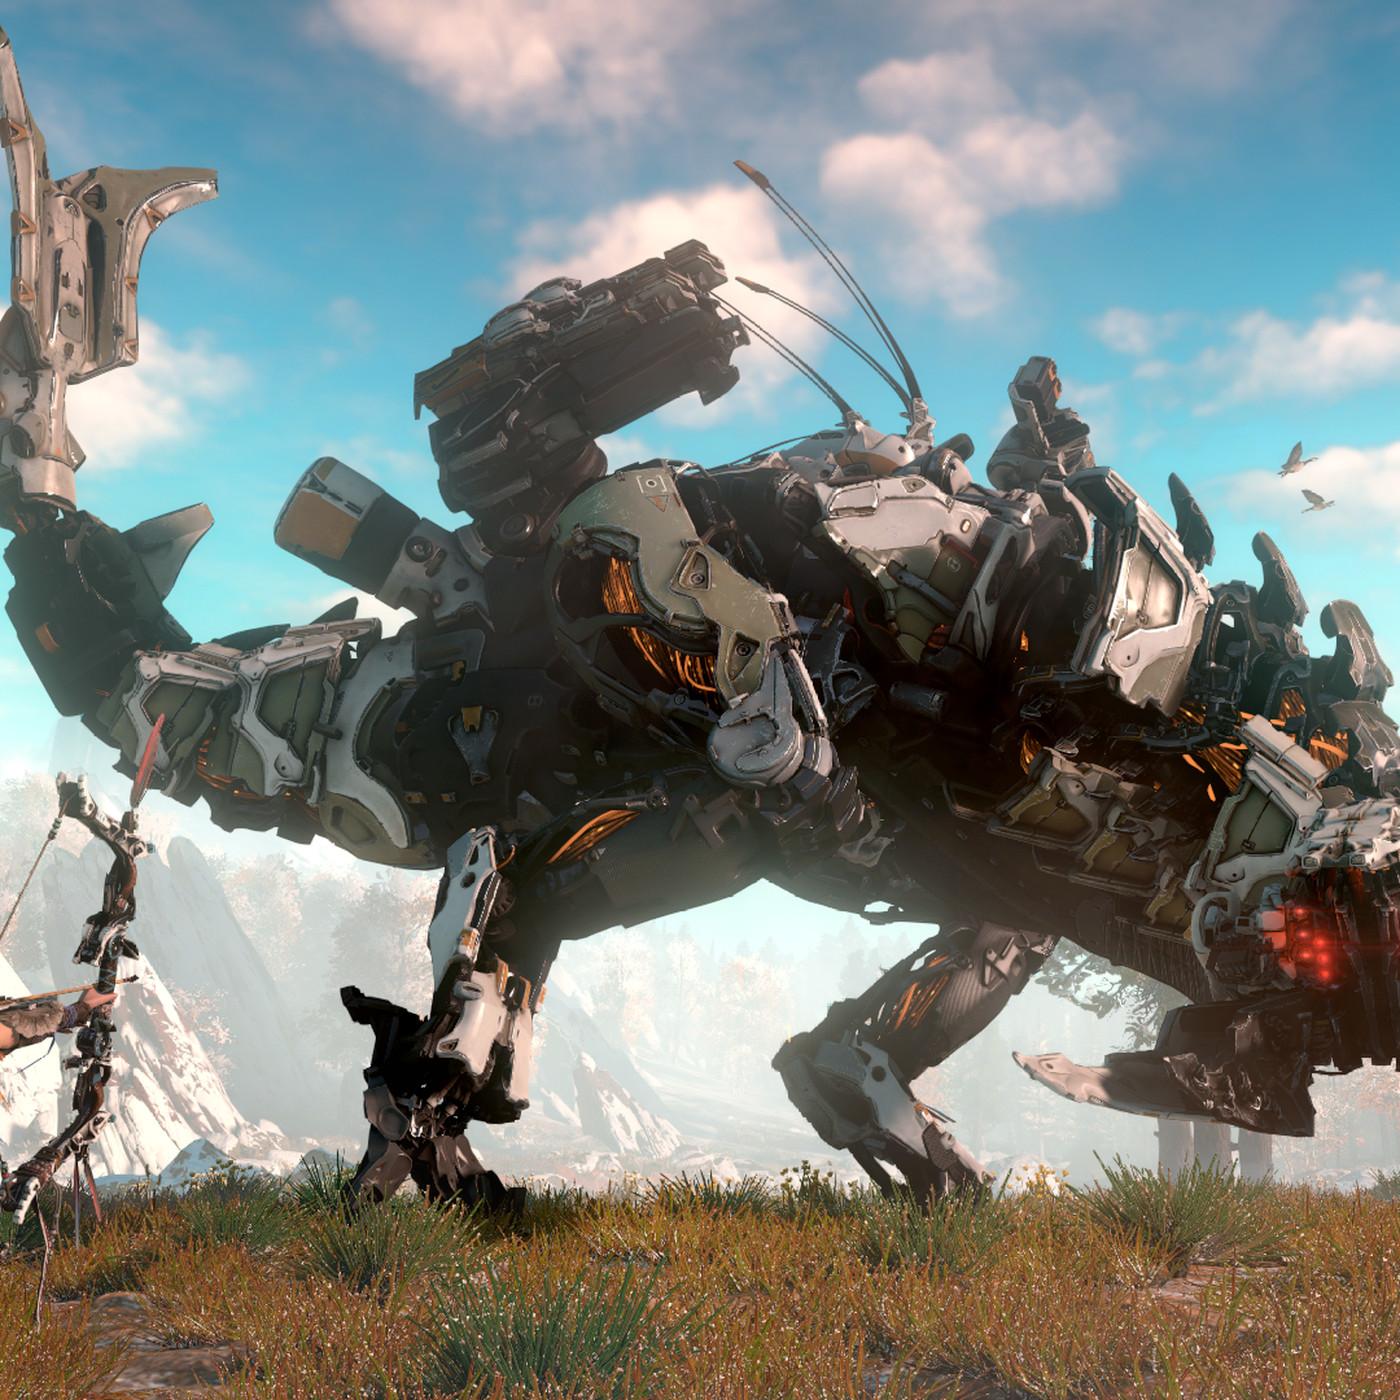 Horizon Zero Dawn: a robot-dinosaur hunting game with